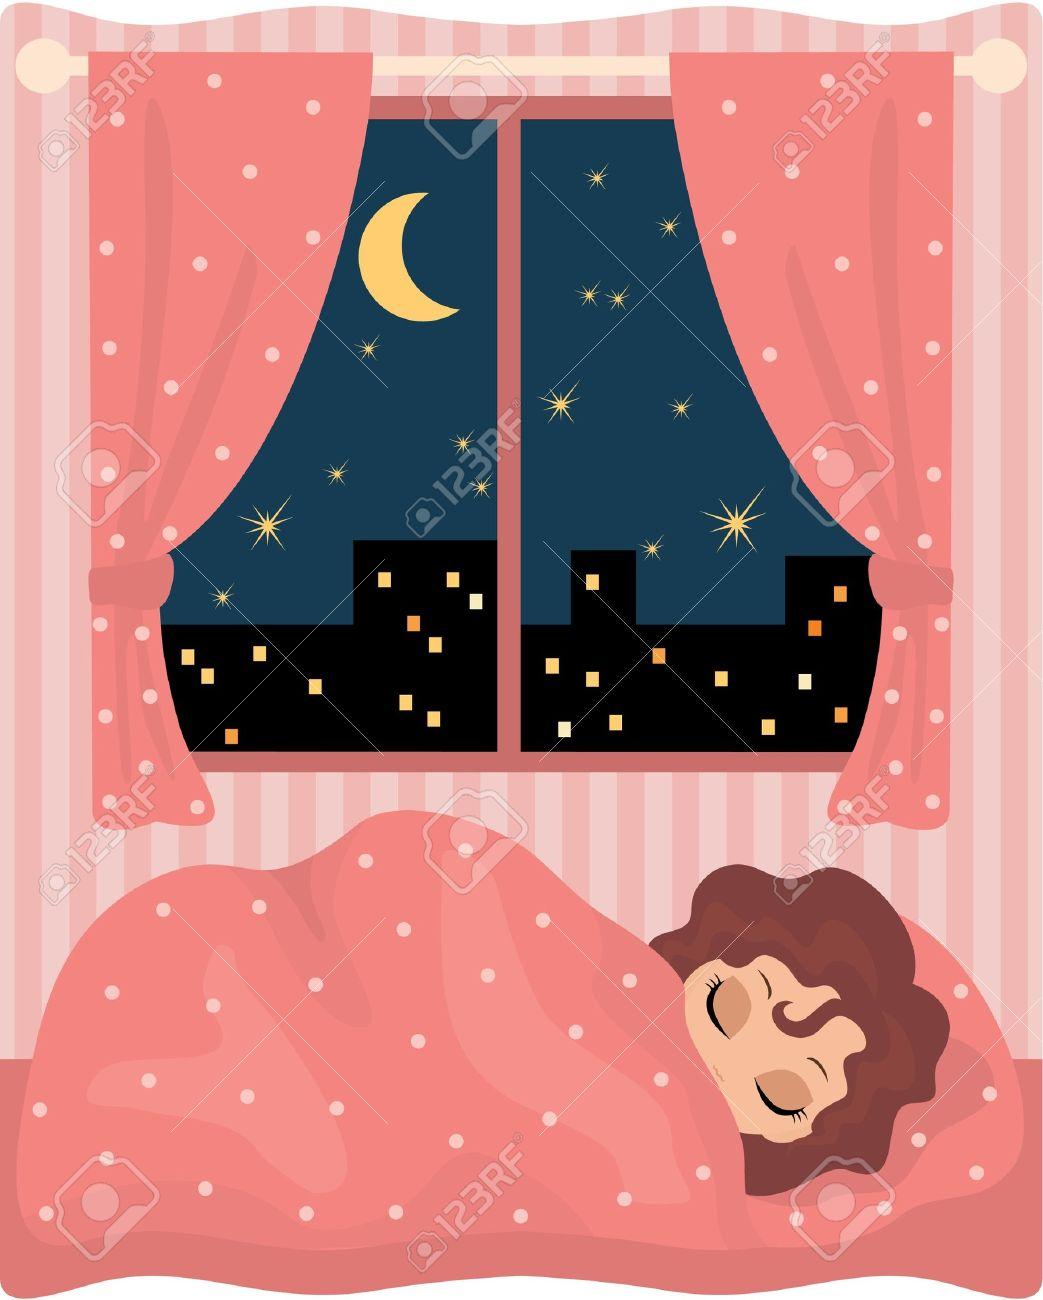 Cute small bed cartoon clipart jpg library Cute small bed cartoon clipart - ClipartFest jpg library